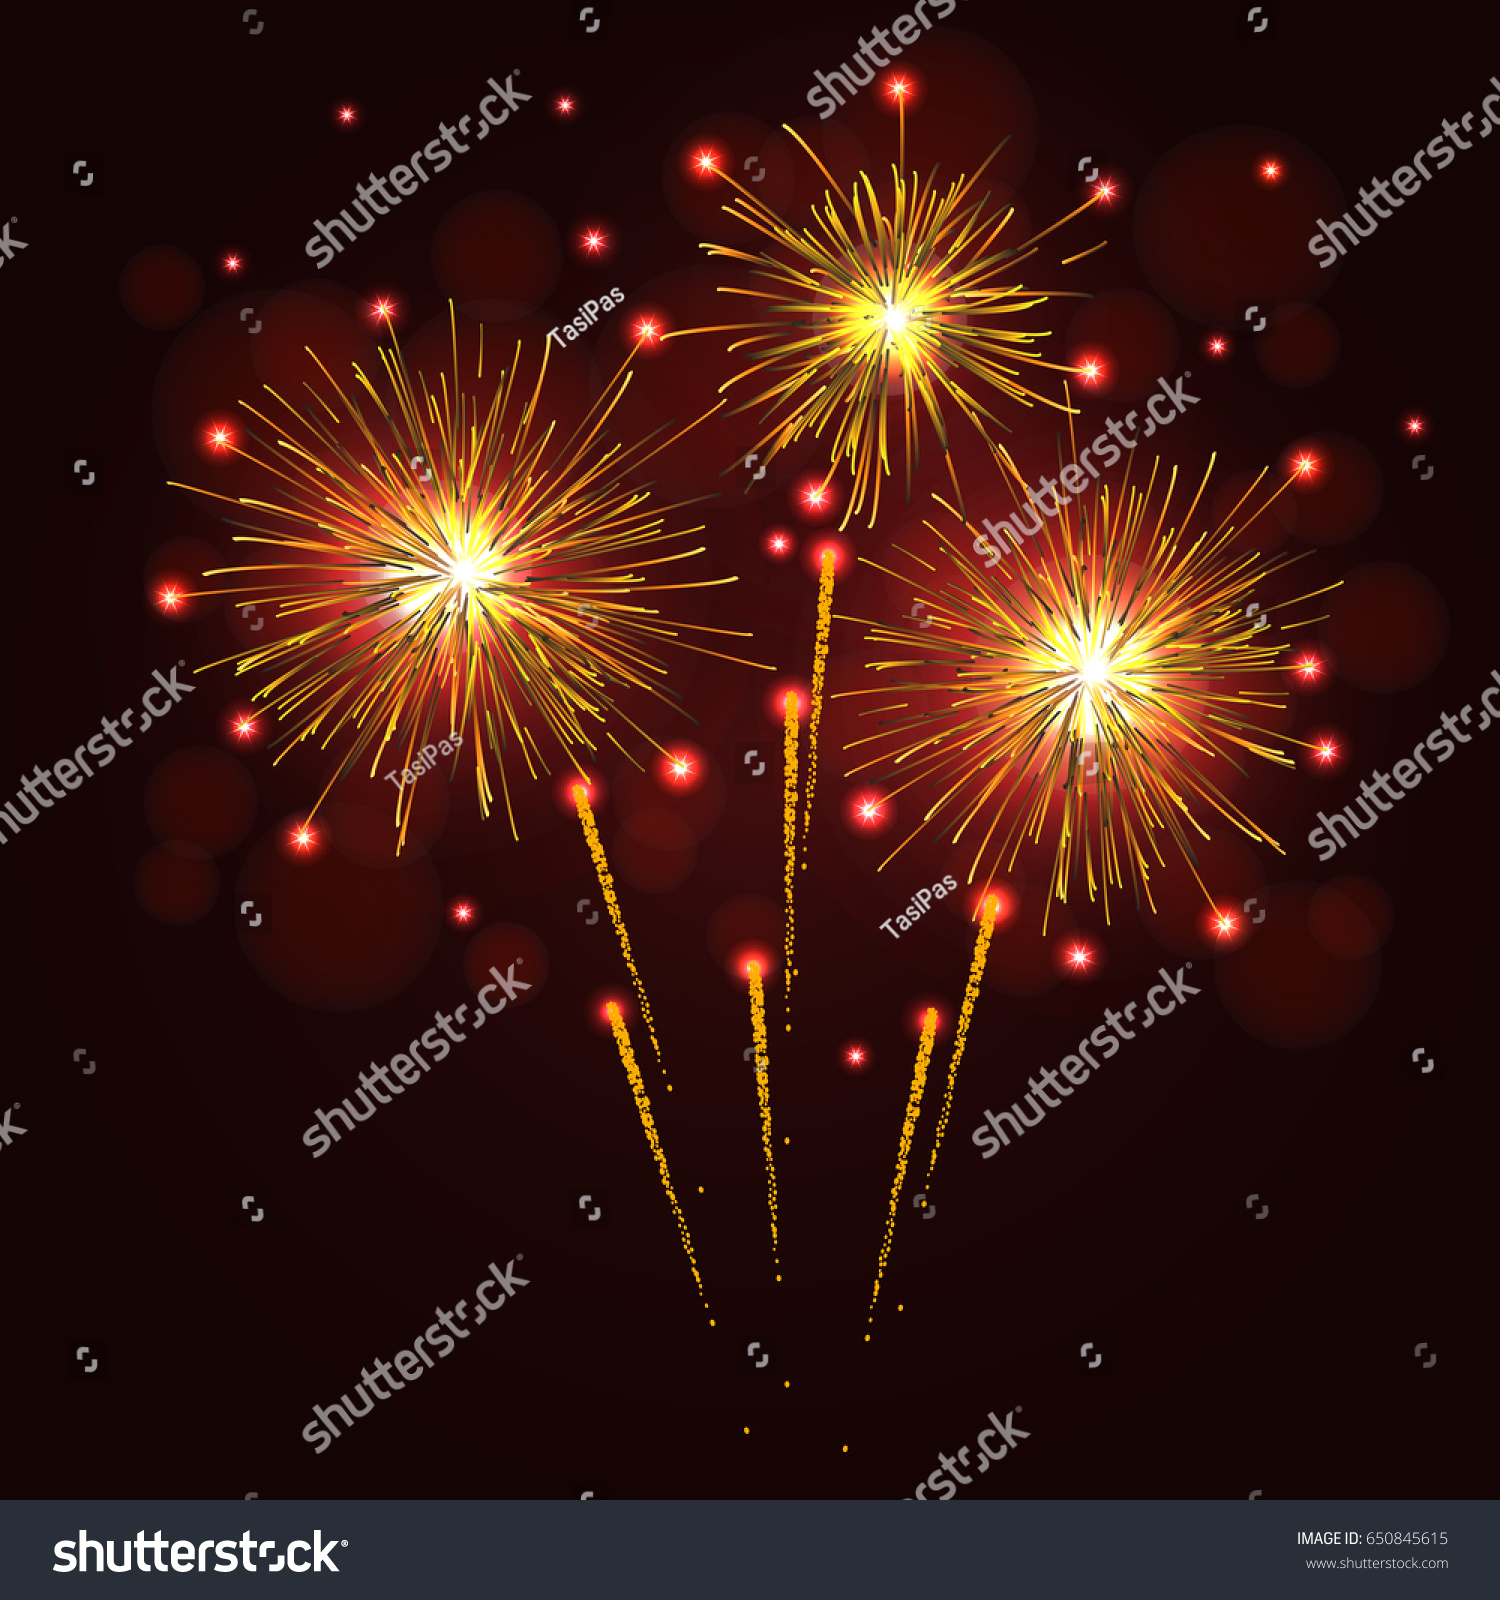 Golden Yellow Sparkling Vector Fireworks Over Stock Vector (Royalty ...